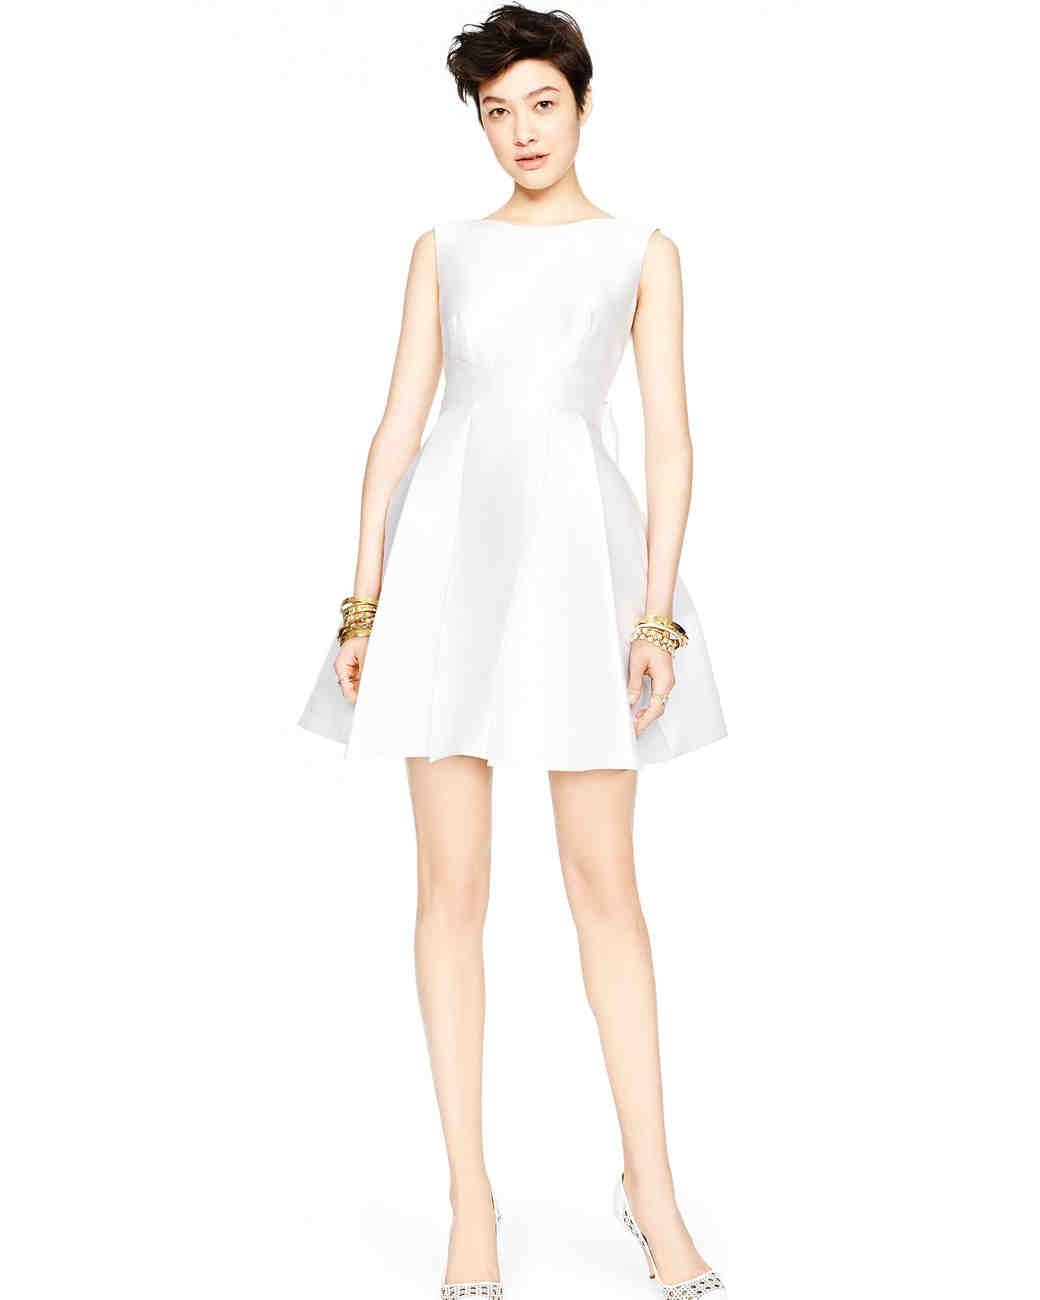 bridal-shower-dress-kate-spade-mini-dress-0416.jpg